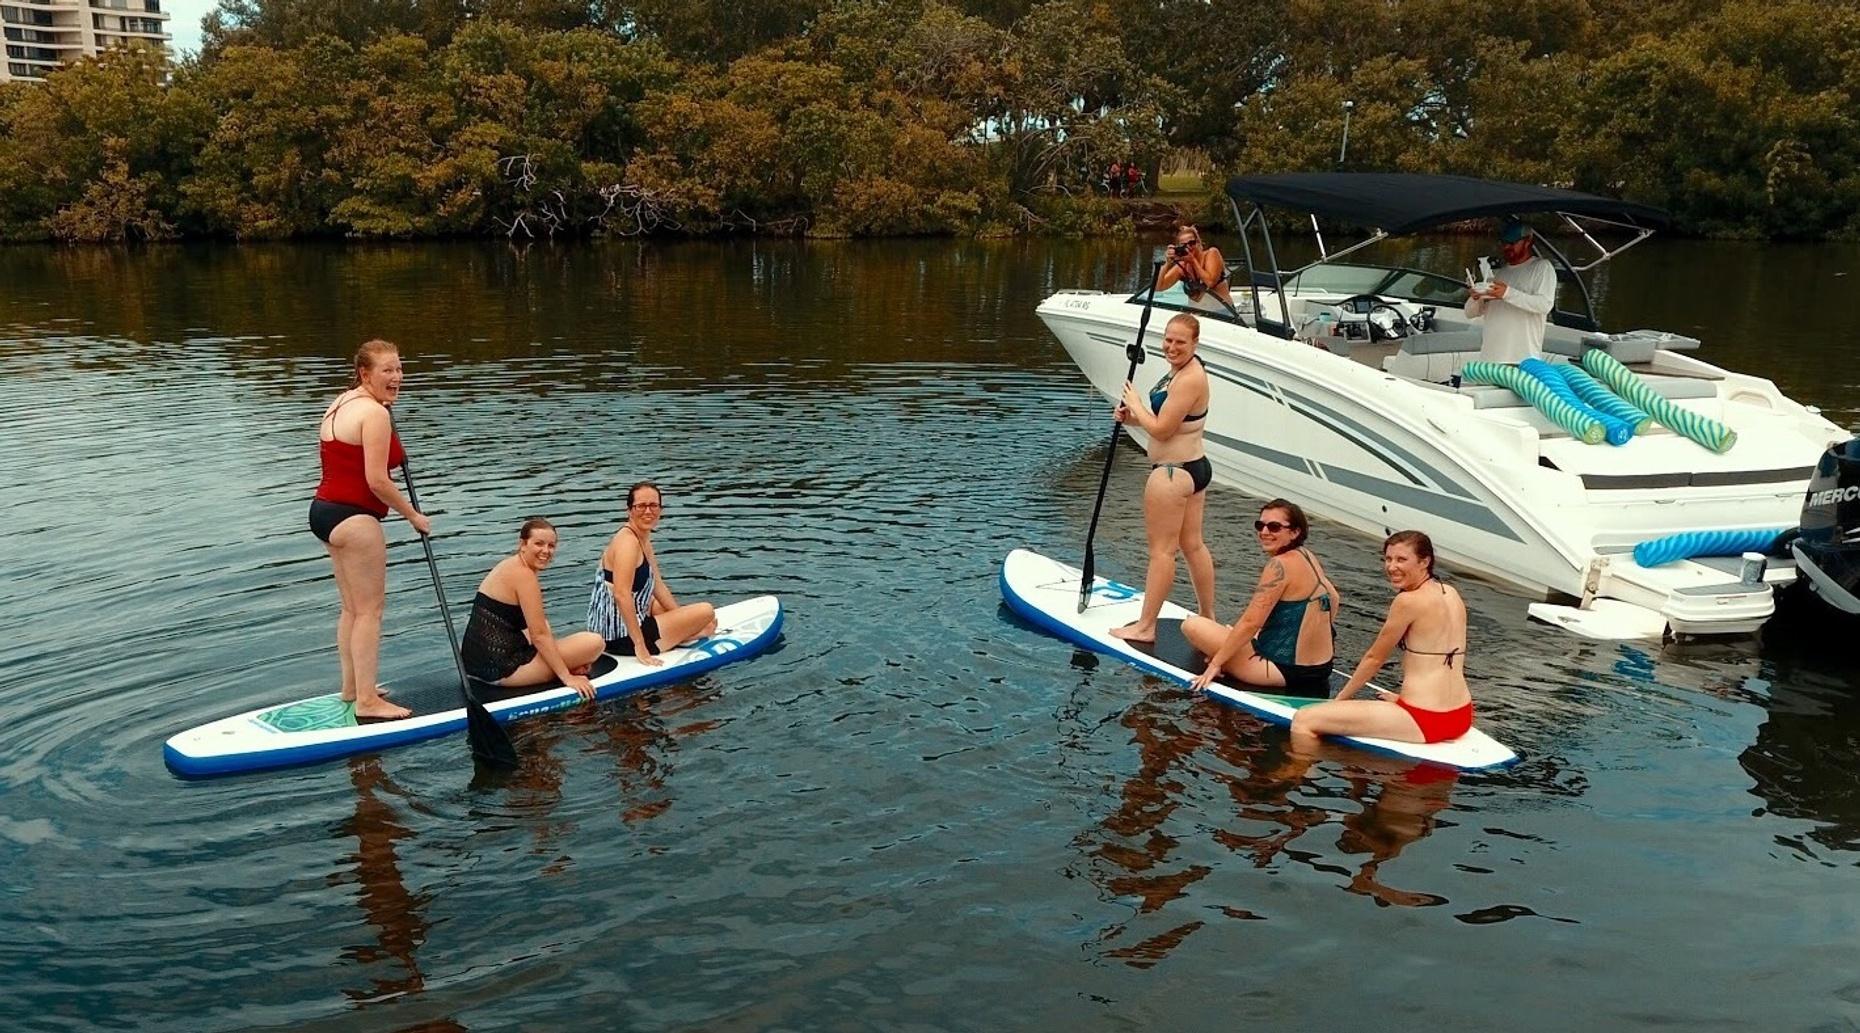 6-Hour Boat Cruise in Sarasota